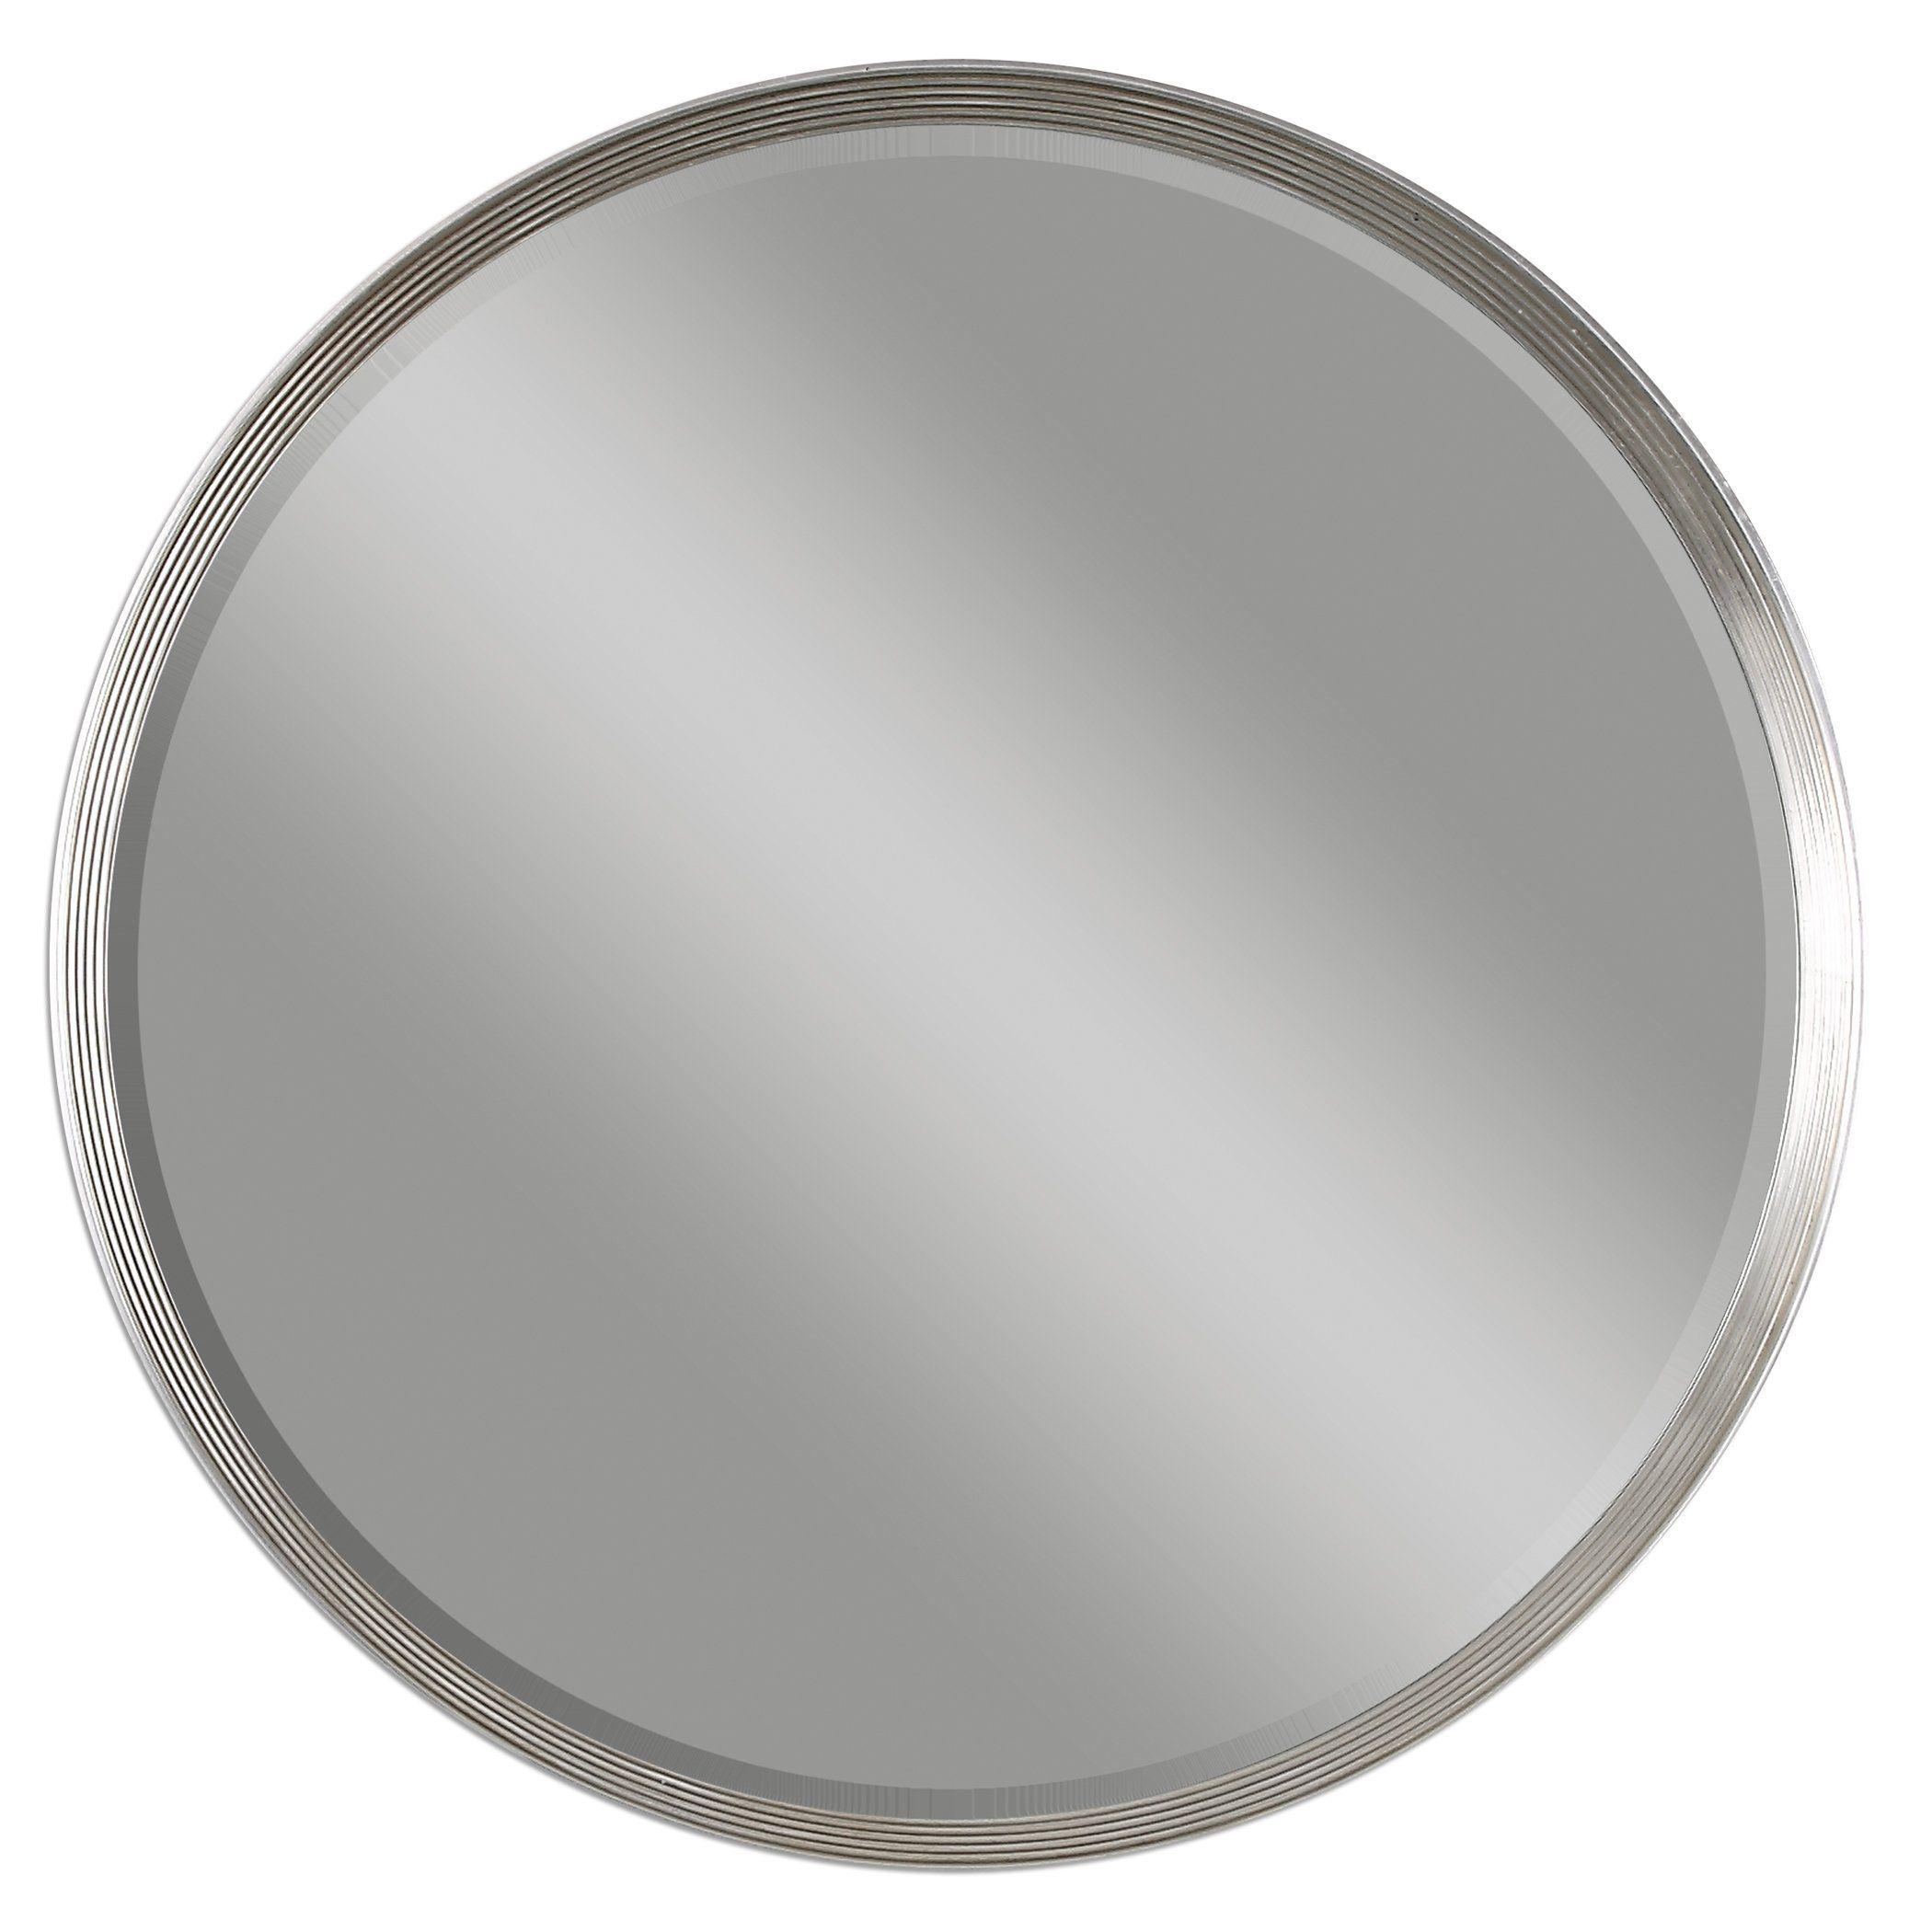 Serenza Round Silver Mirror In 2021 Mirror Wall Antique Mirror Wall Mirror Design Wall